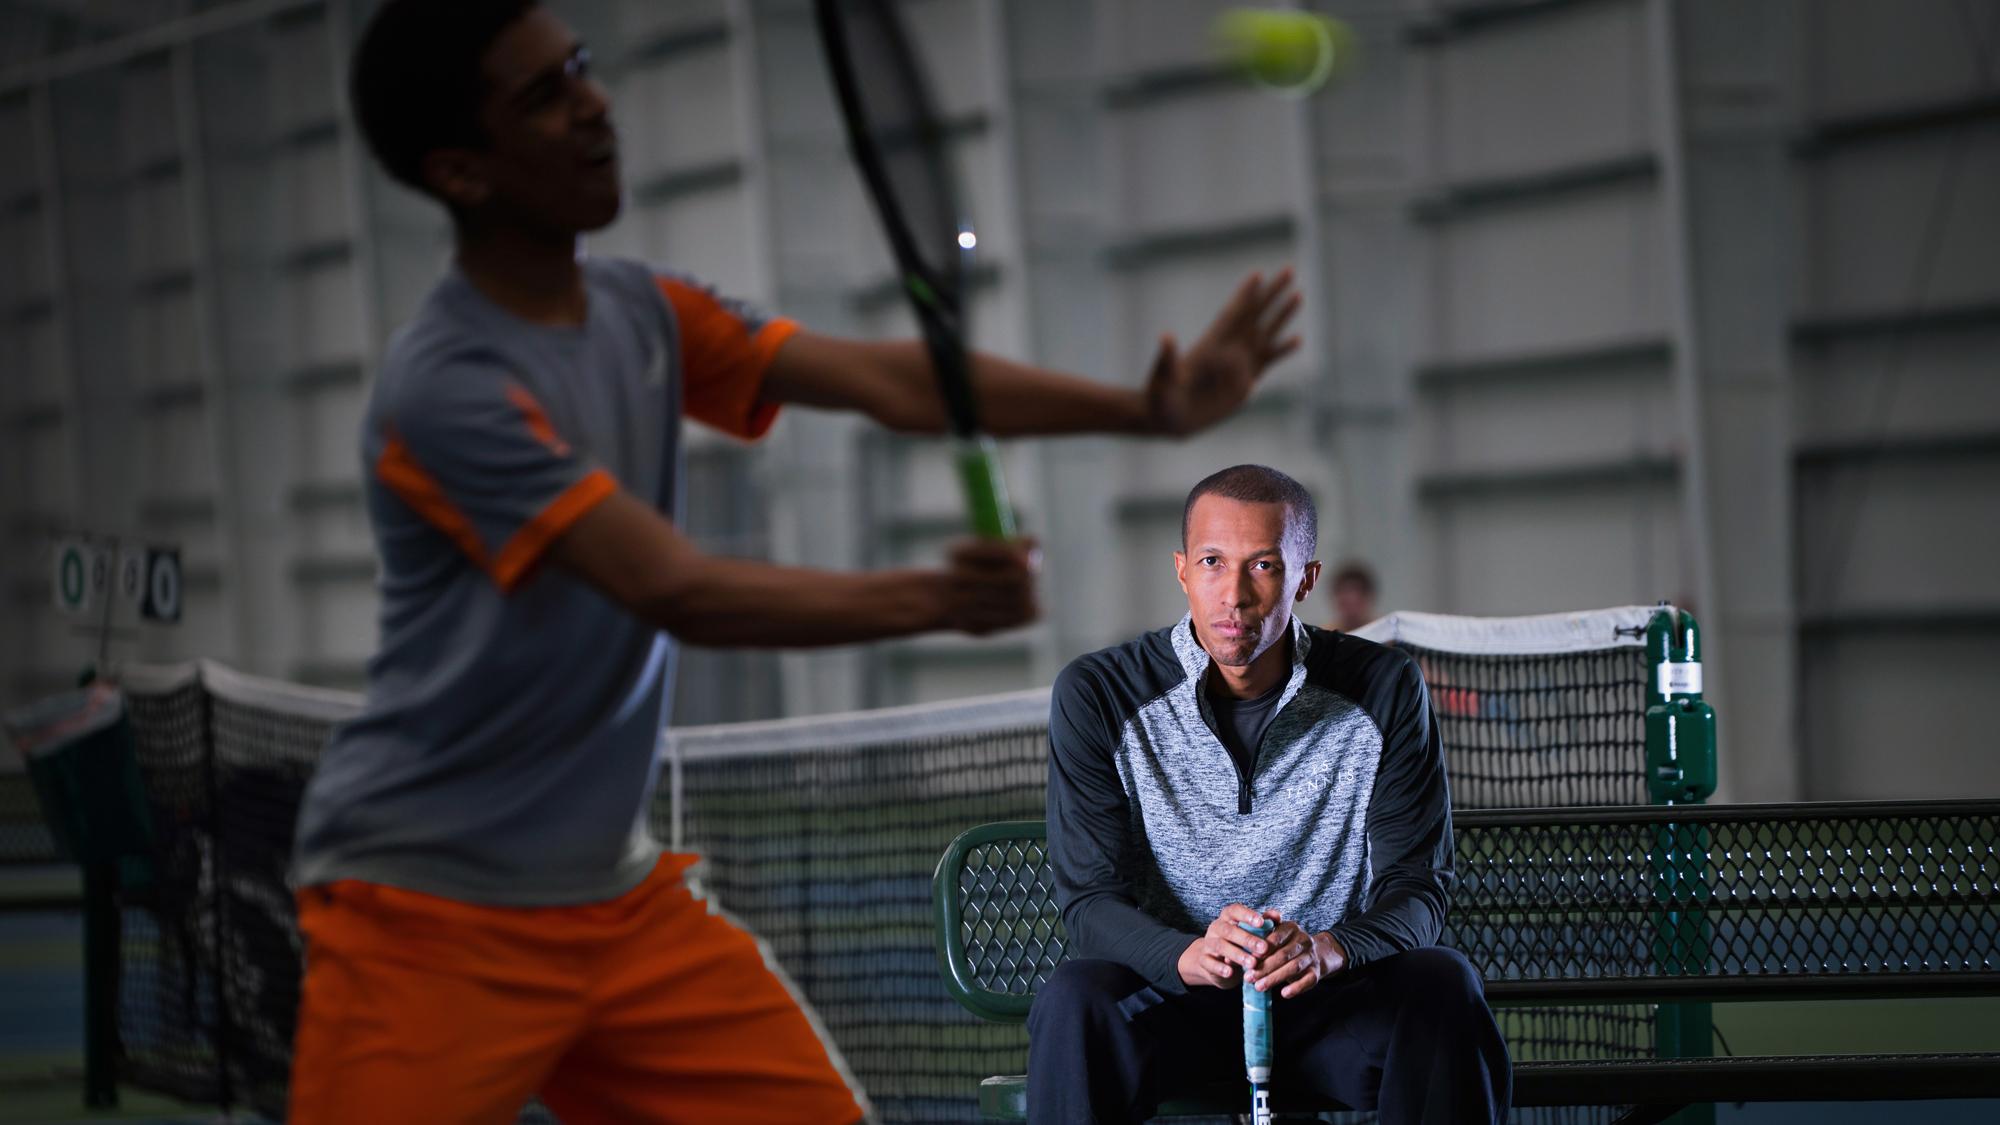 Tennis coach Kamau Murray trains the next generation.